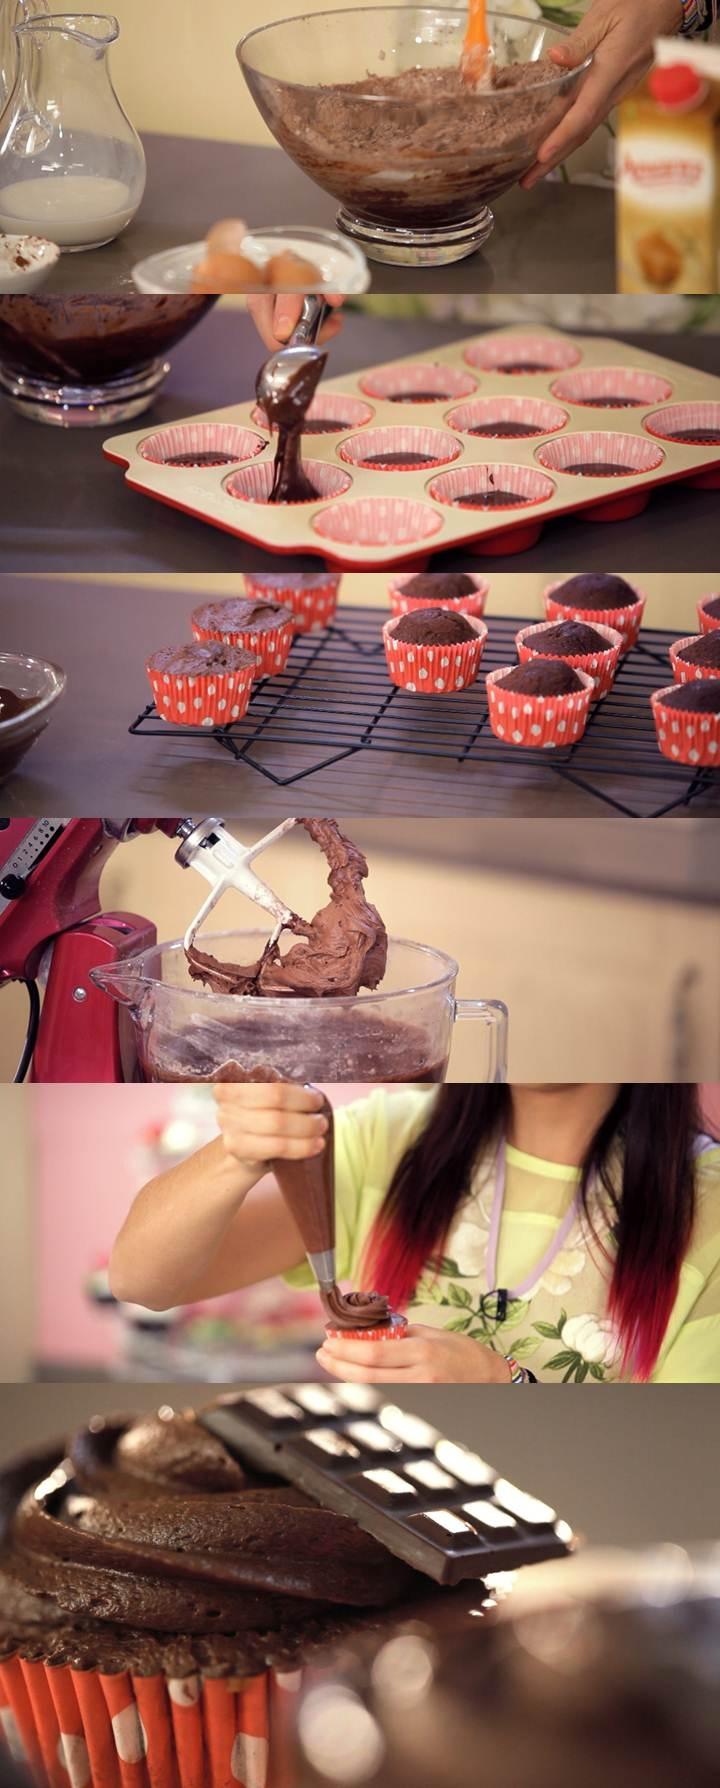 Programa 1 de Cupcake Maniacs:  Cupcakes de chocolate